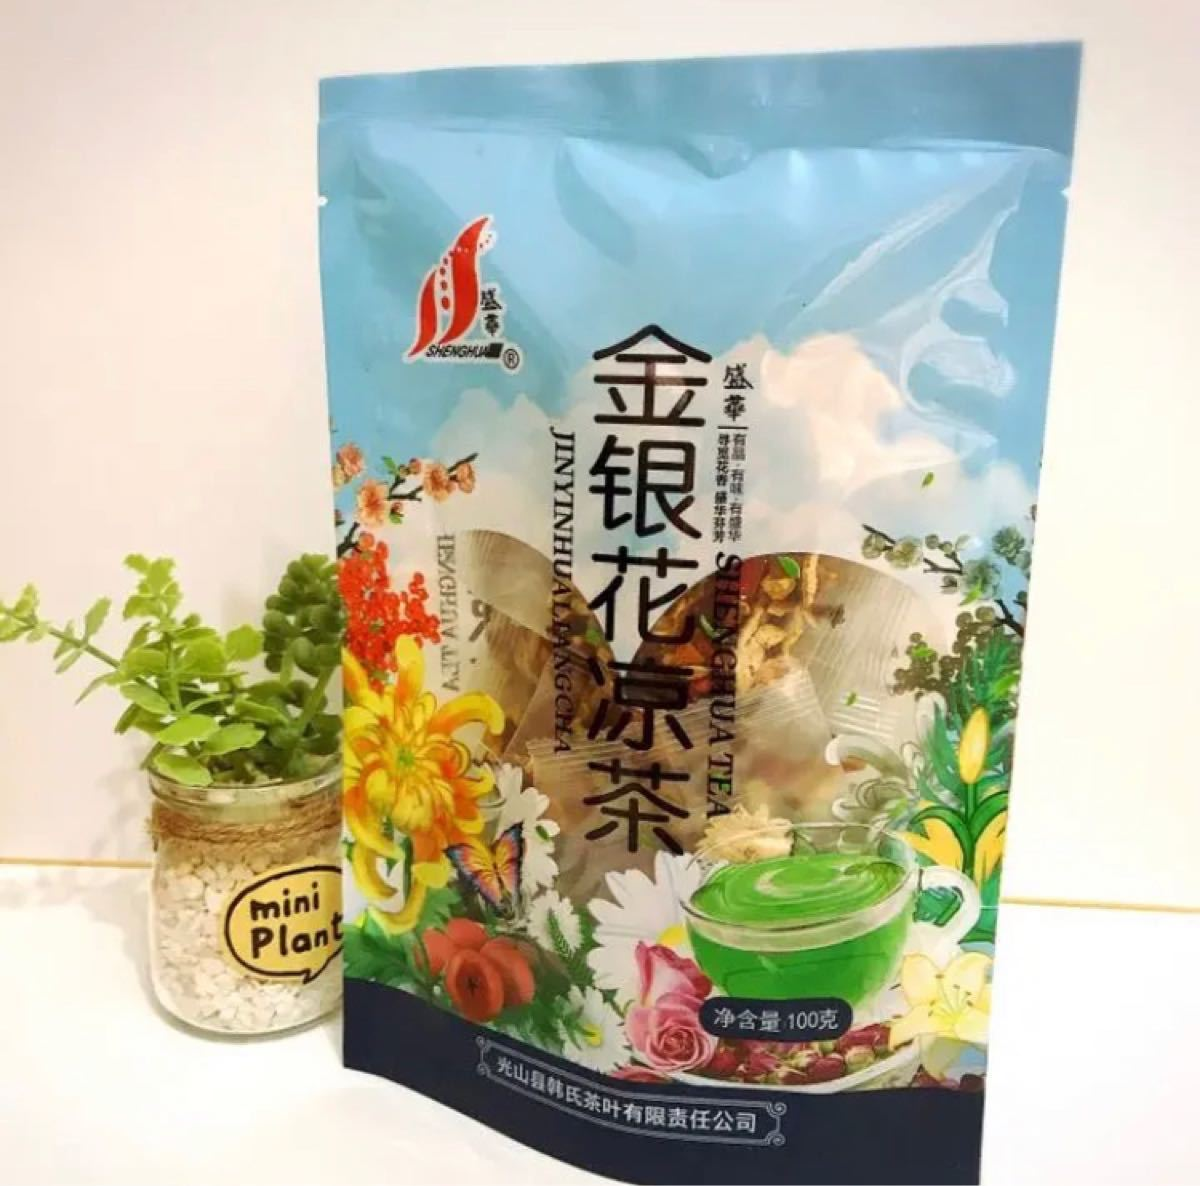 金銀花涼茶 健康茶 薬膳茶 漢方茶 美容茶 花茶 ハーブティー